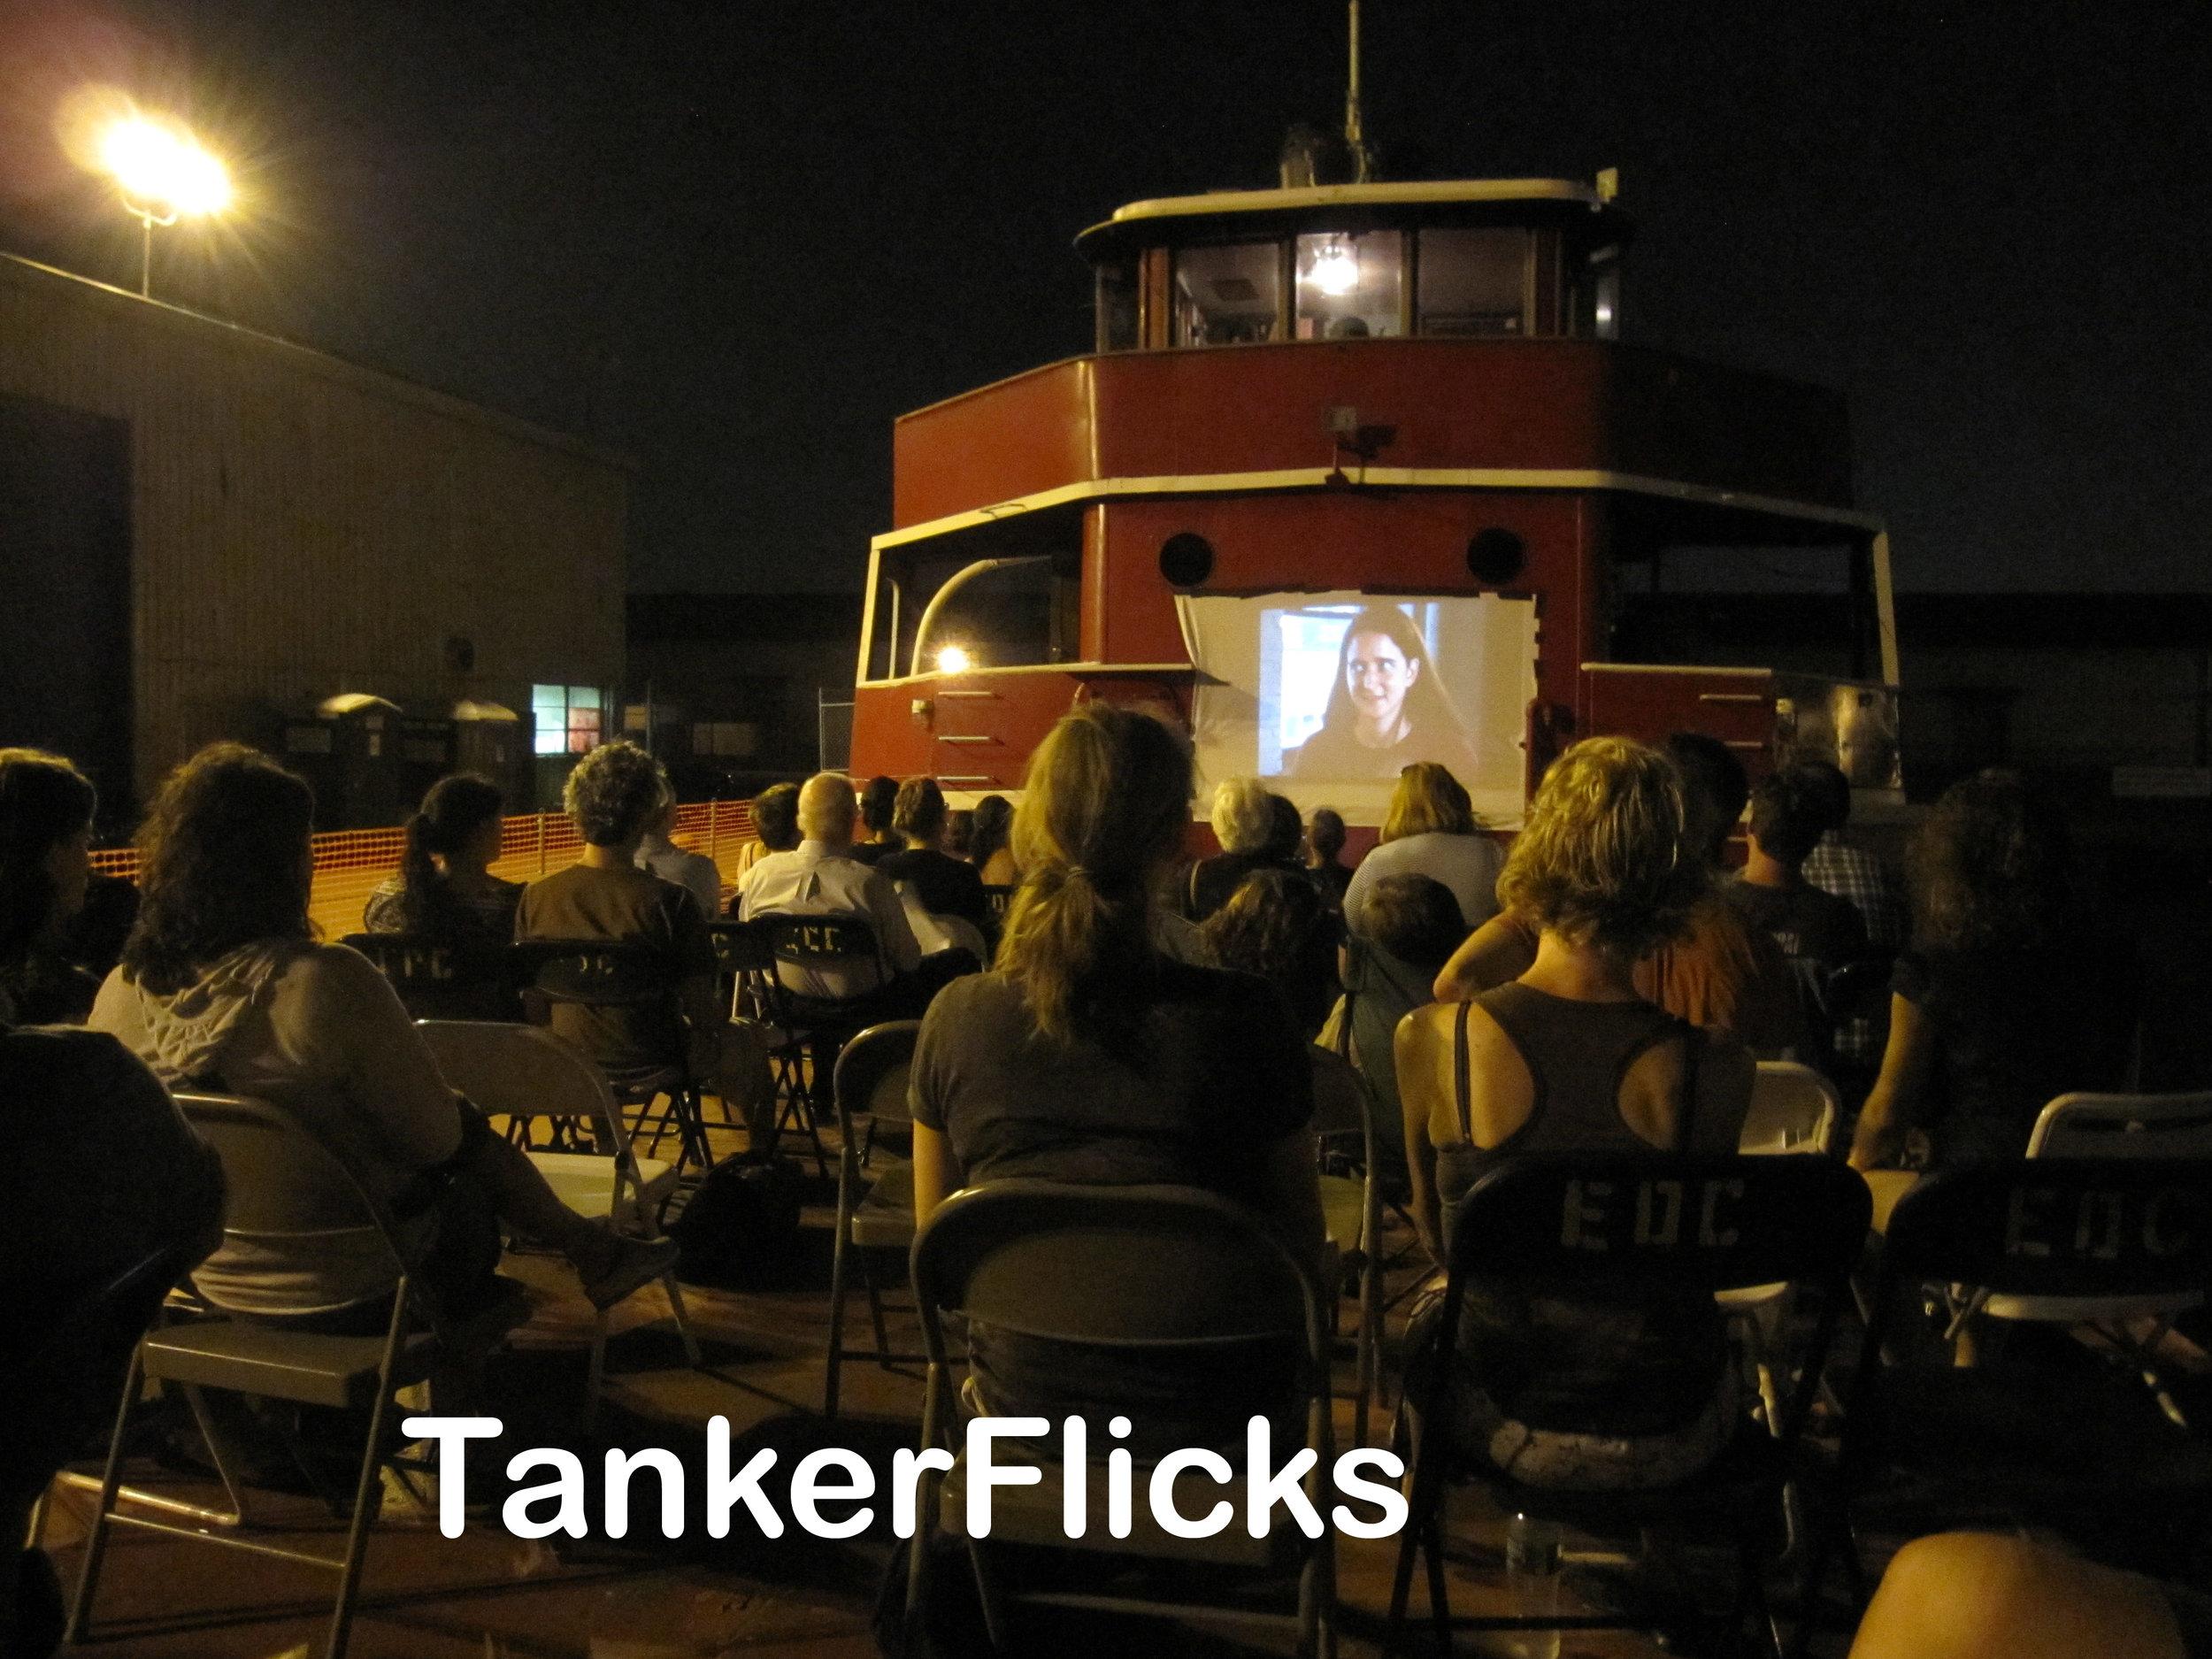 TankerFlicks w-caption.jpg